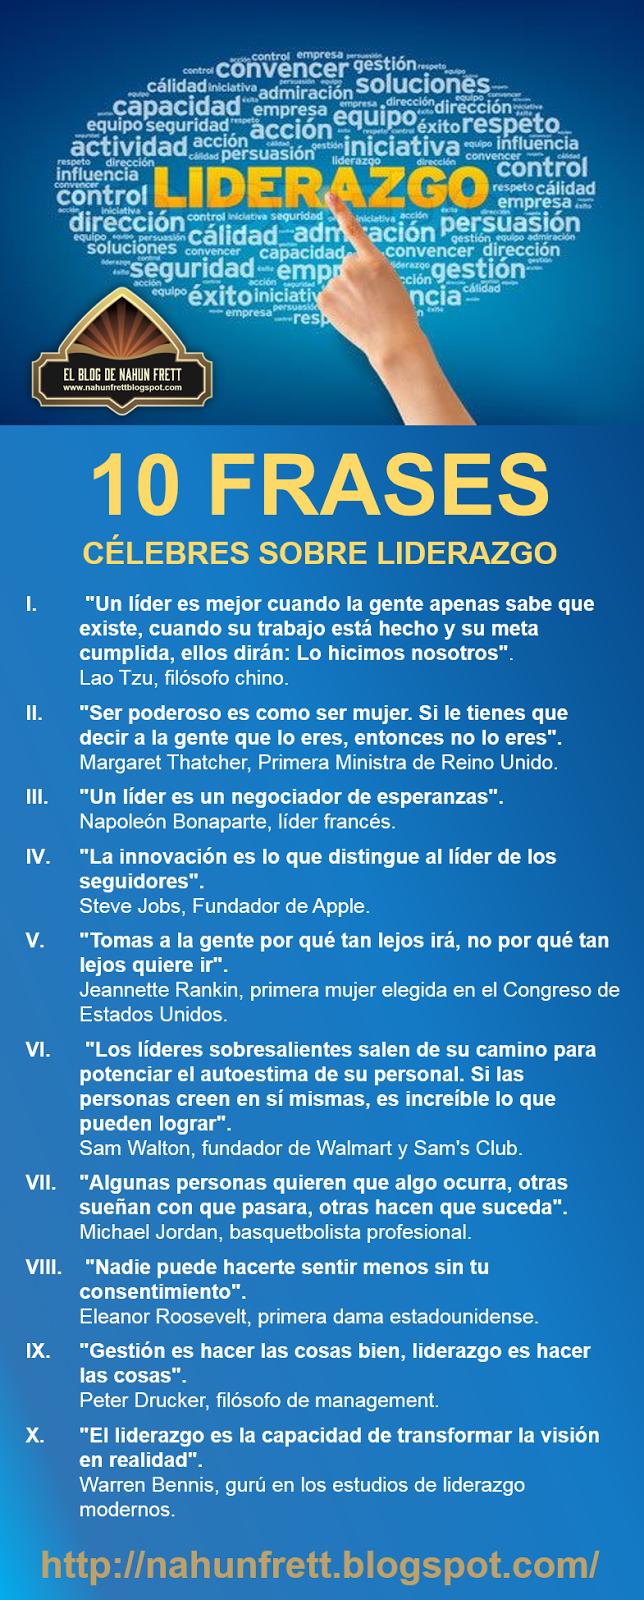 Xavier Mármol Blum 10 Frases Célebres Sobre Liderazgo